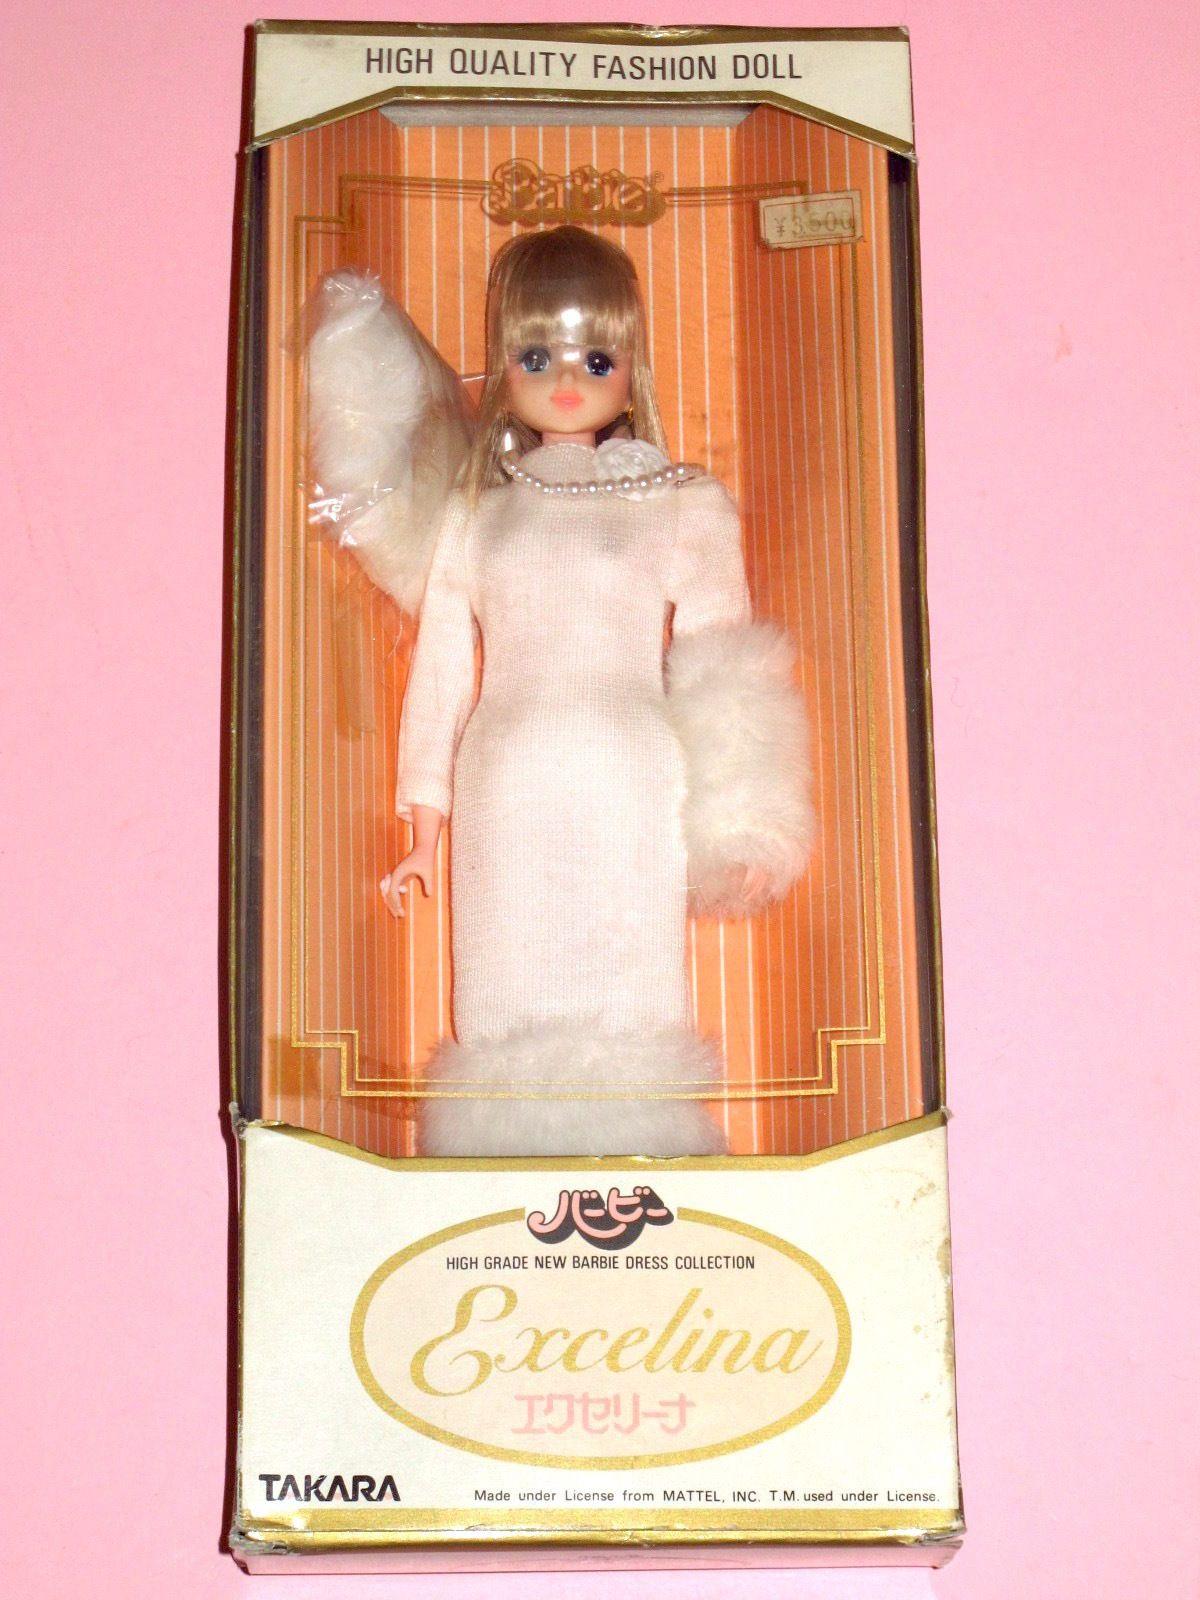 "Takara Excelina 11"" Barbie Doll Mattel NRFB 223.5+50"